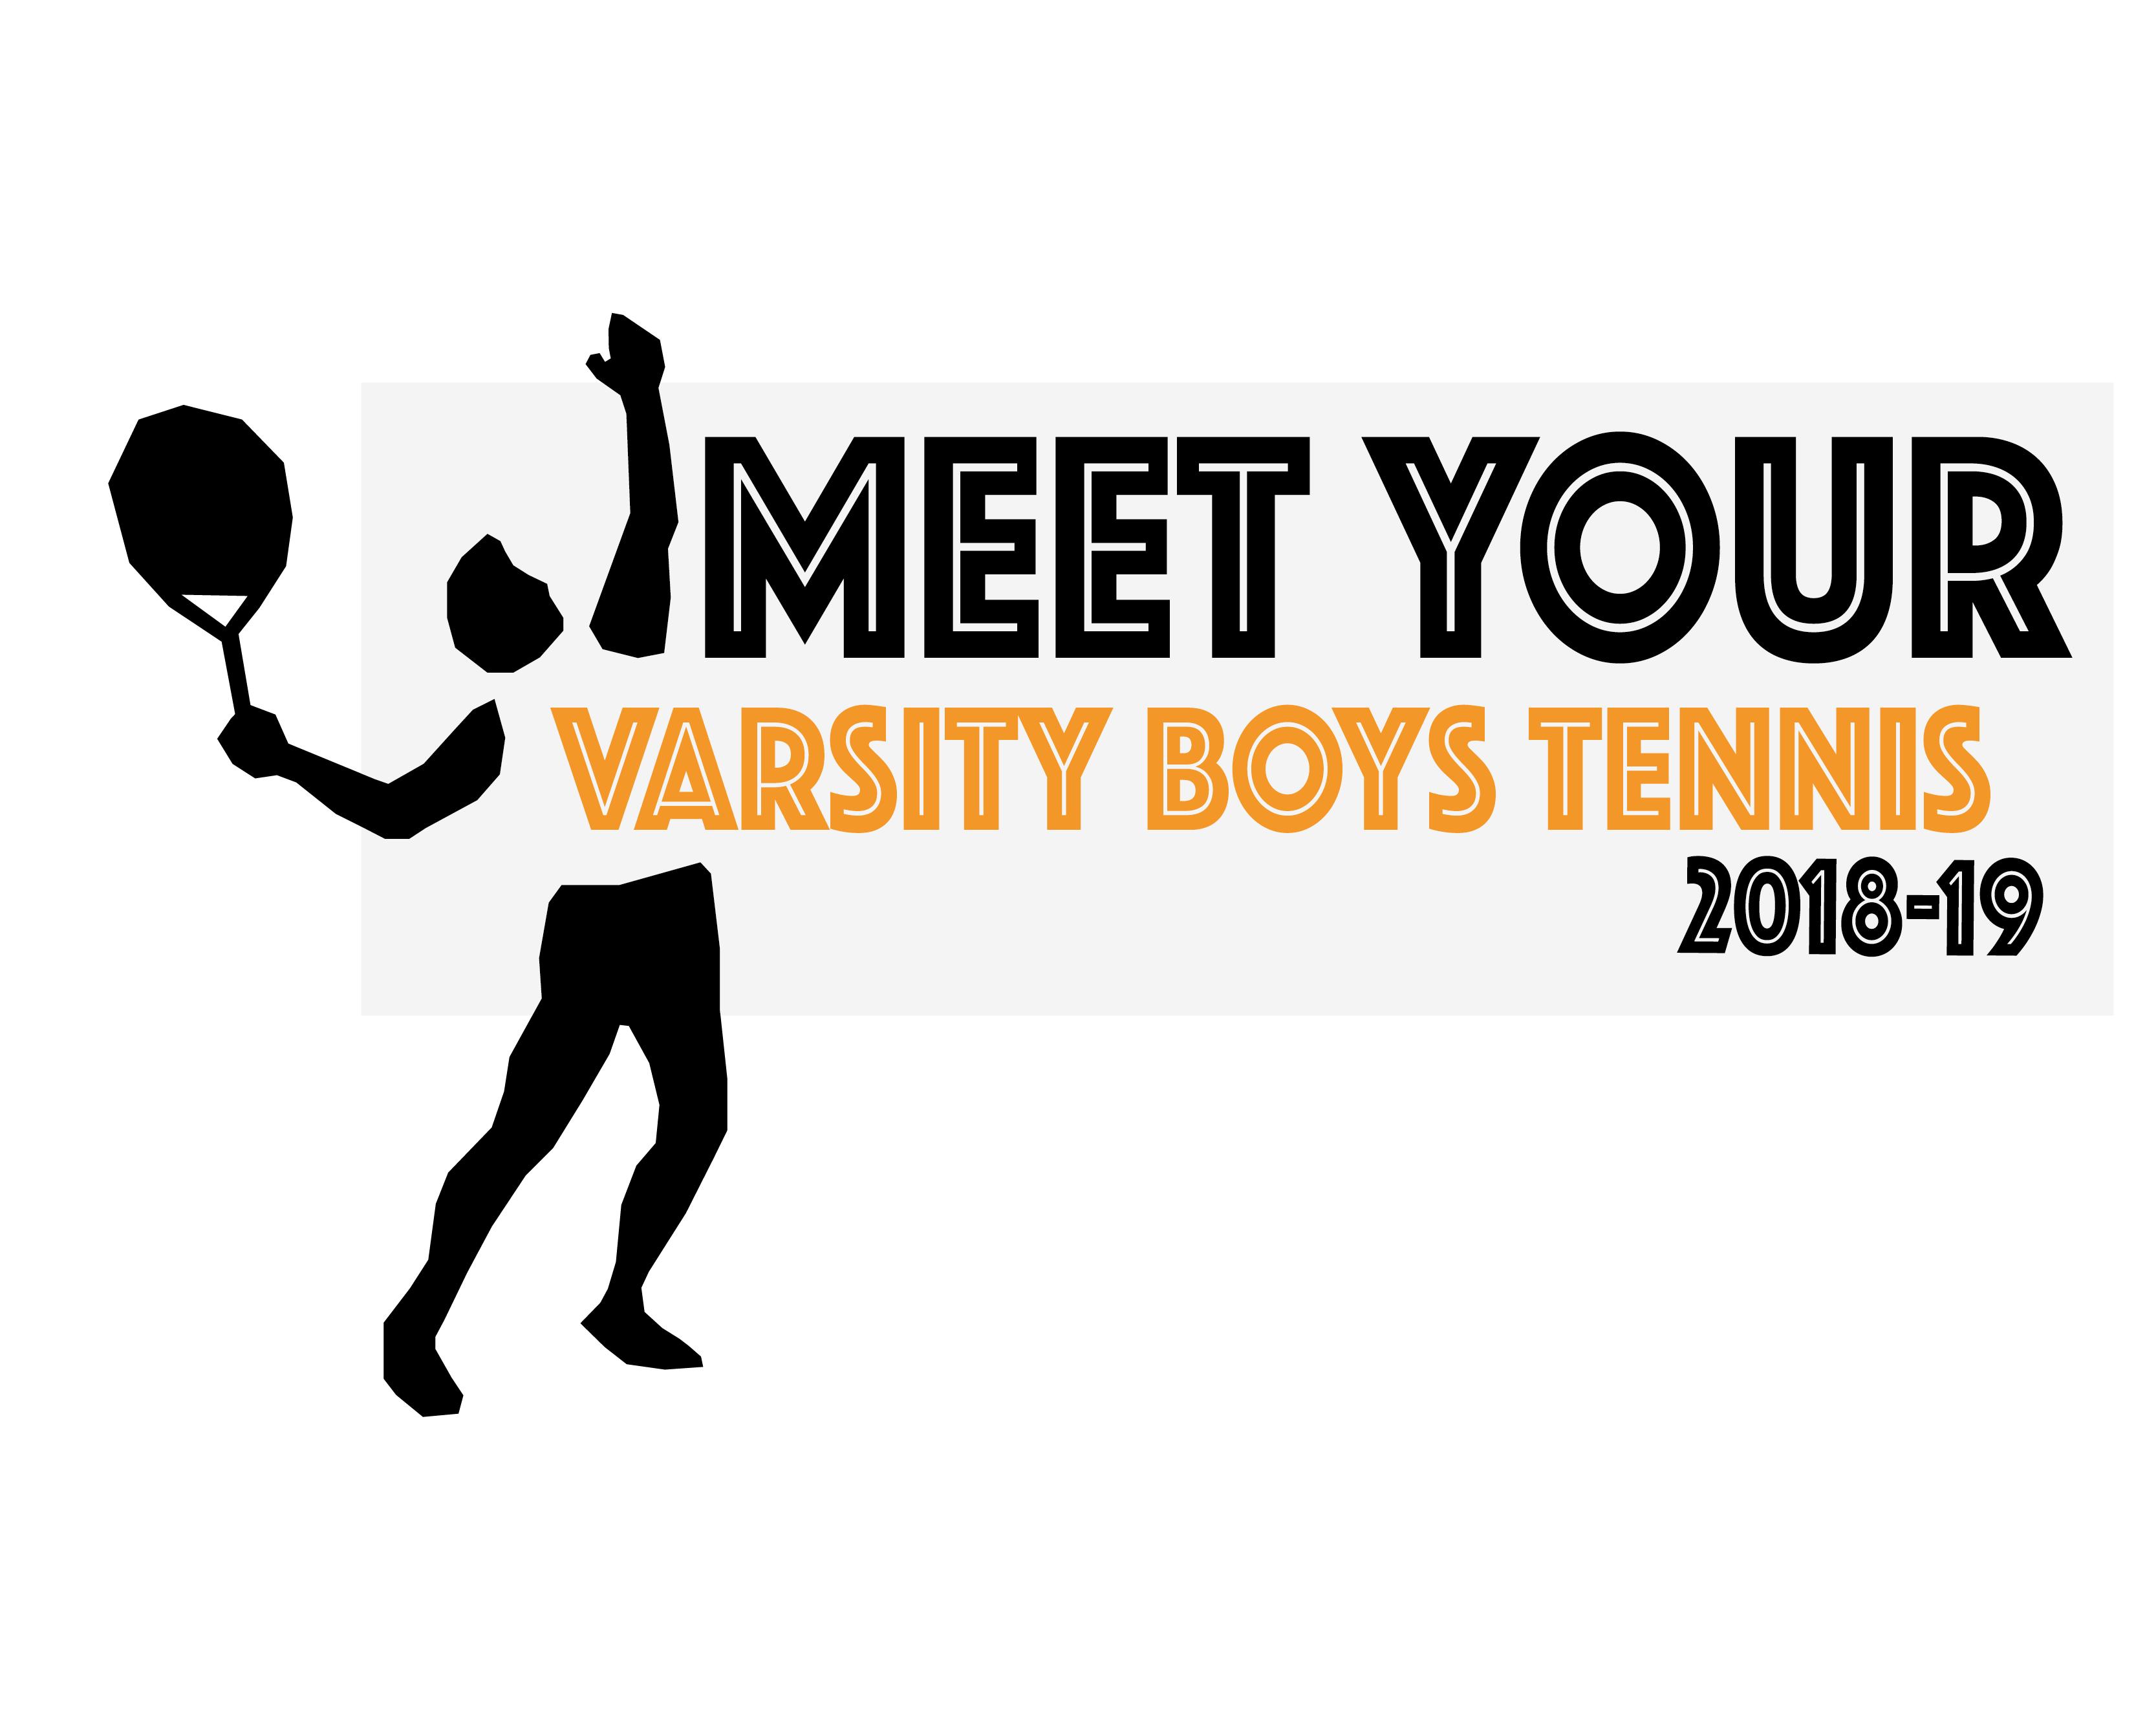 Meet Your Varsity Boys Tennis Team 18-19